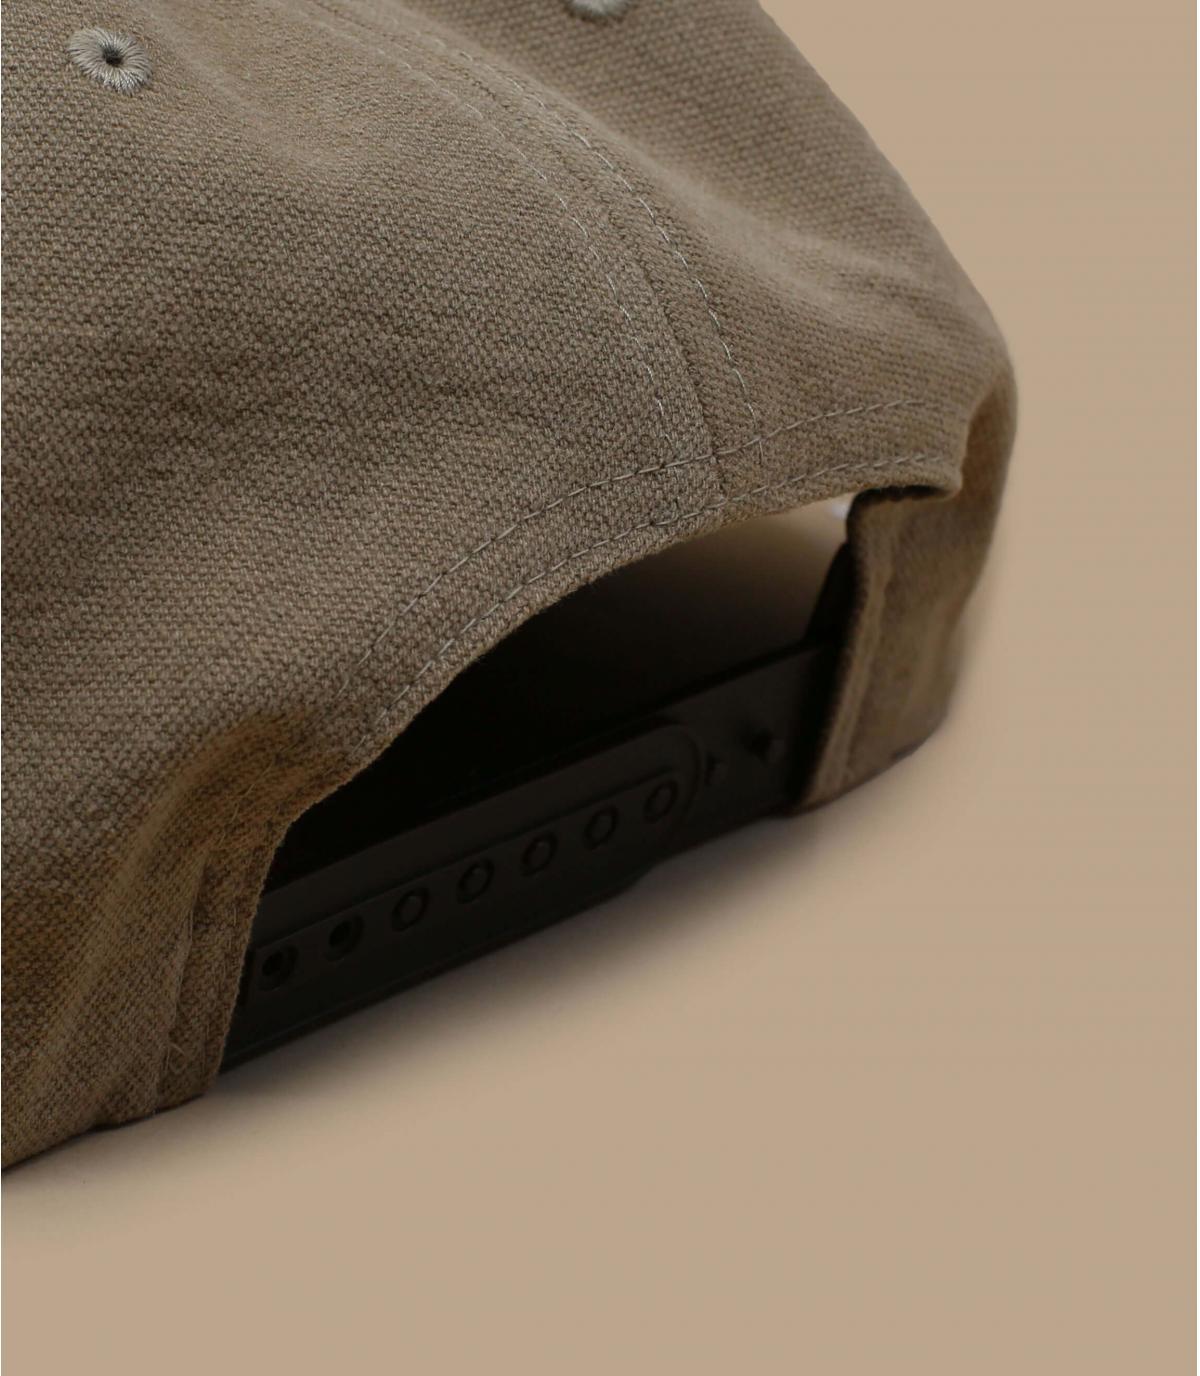 Details Brood black - Abbildung 4